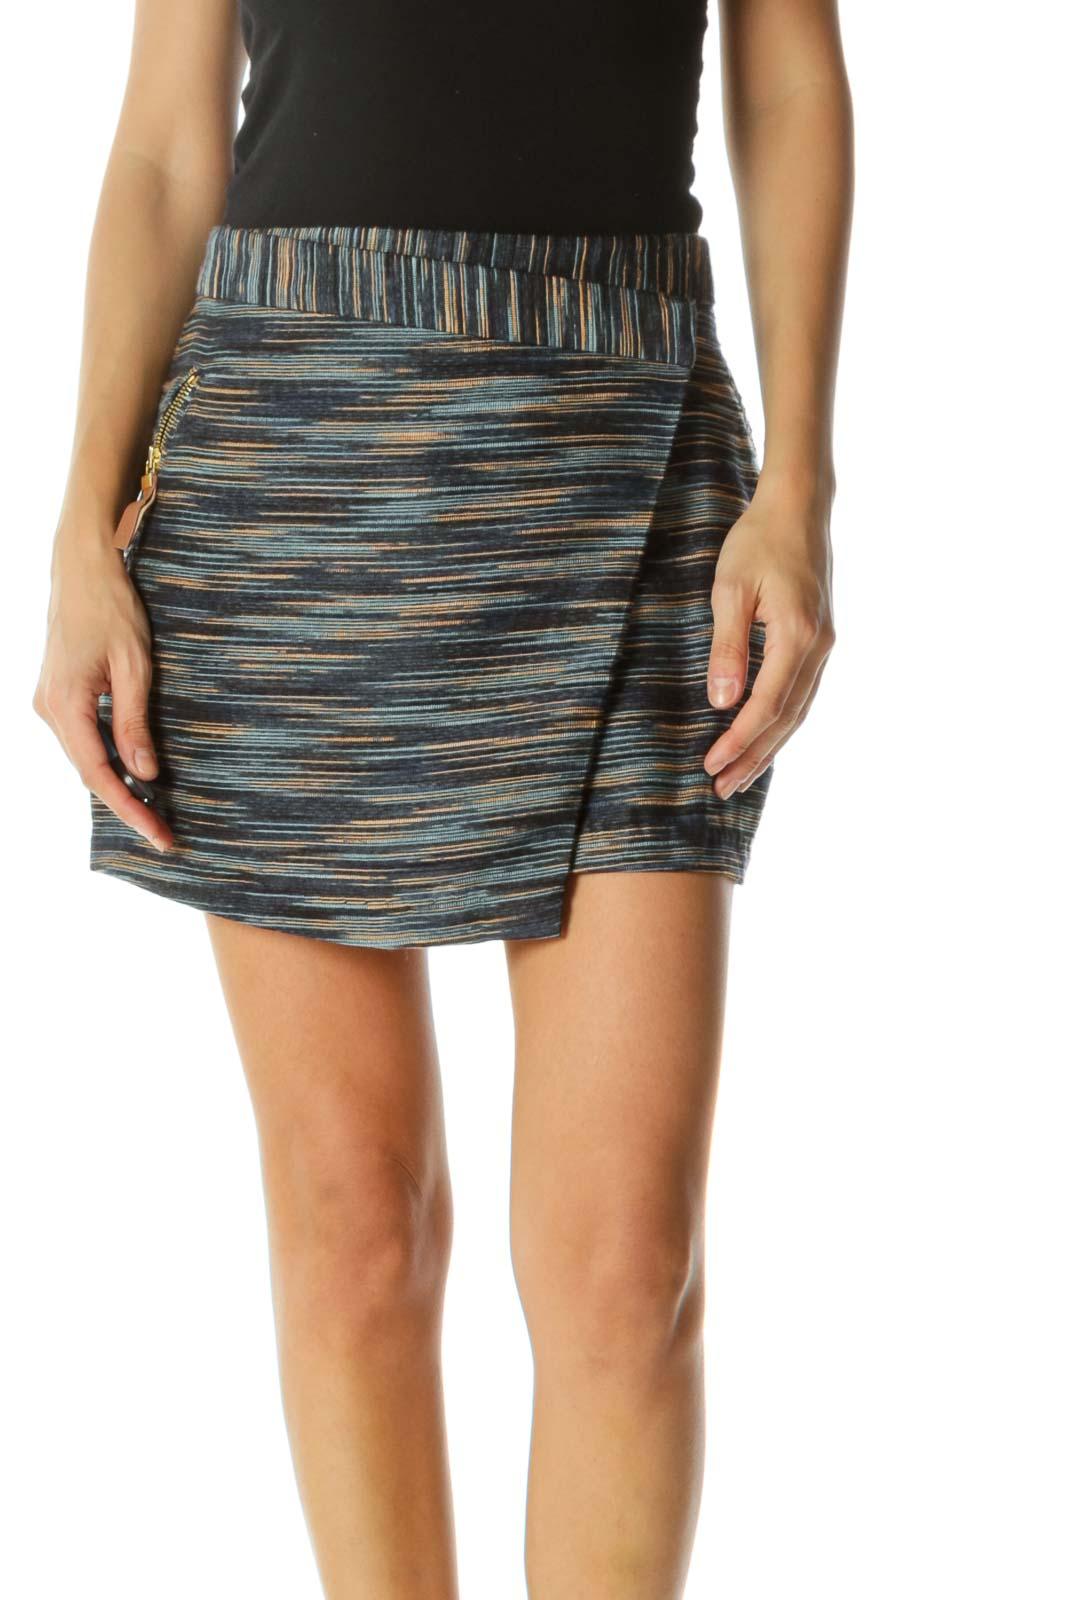 Blue Beige Textured Knit Gold Zippers Mini Skirt Front